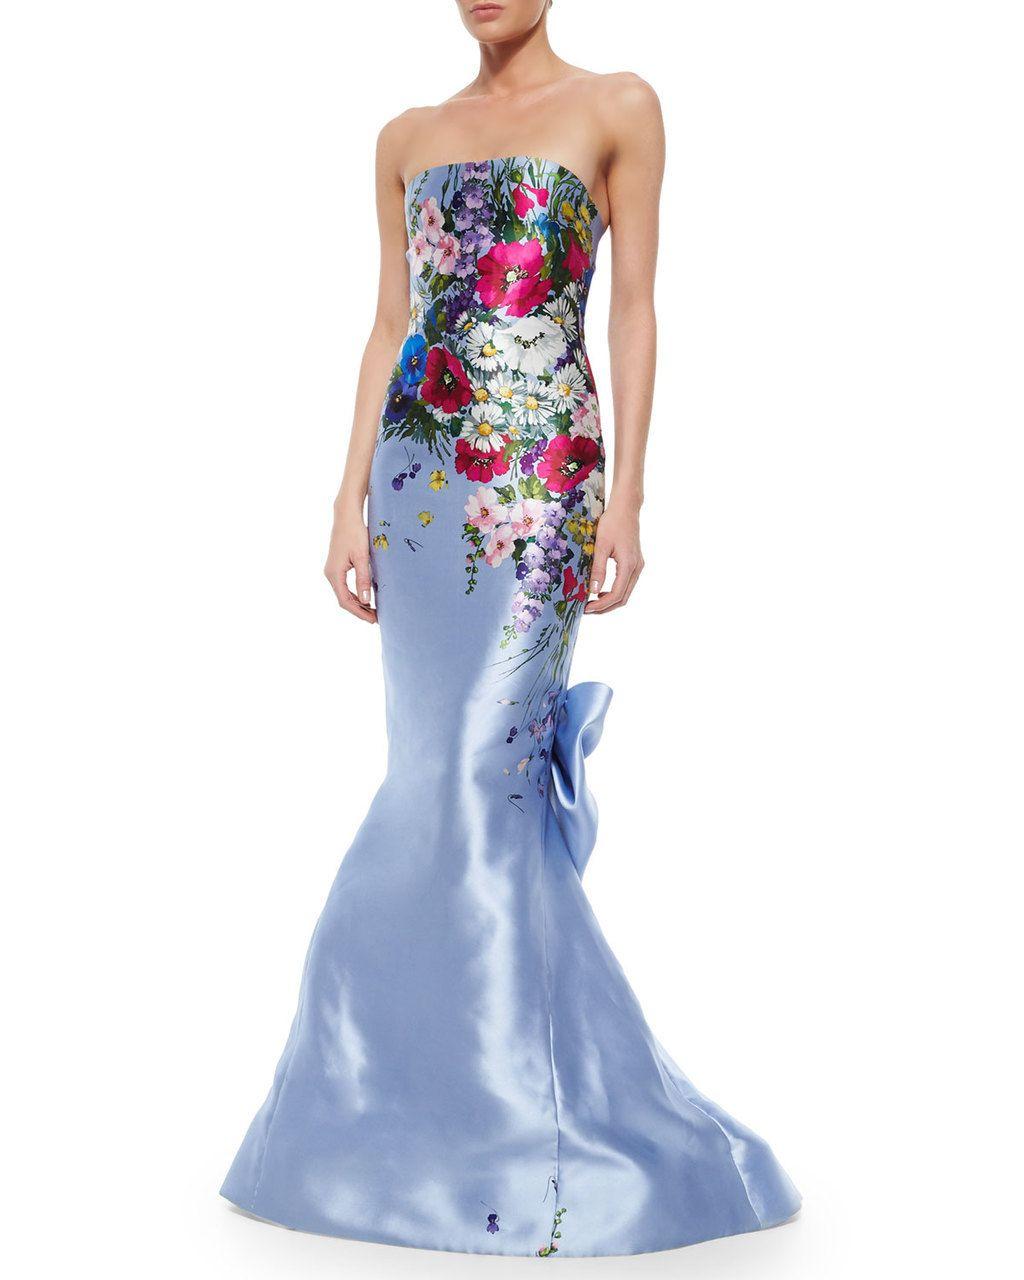 OSCAR DE LA RENTA Strapless Floral Printed Taffeta Gown Periwinkle $6,850